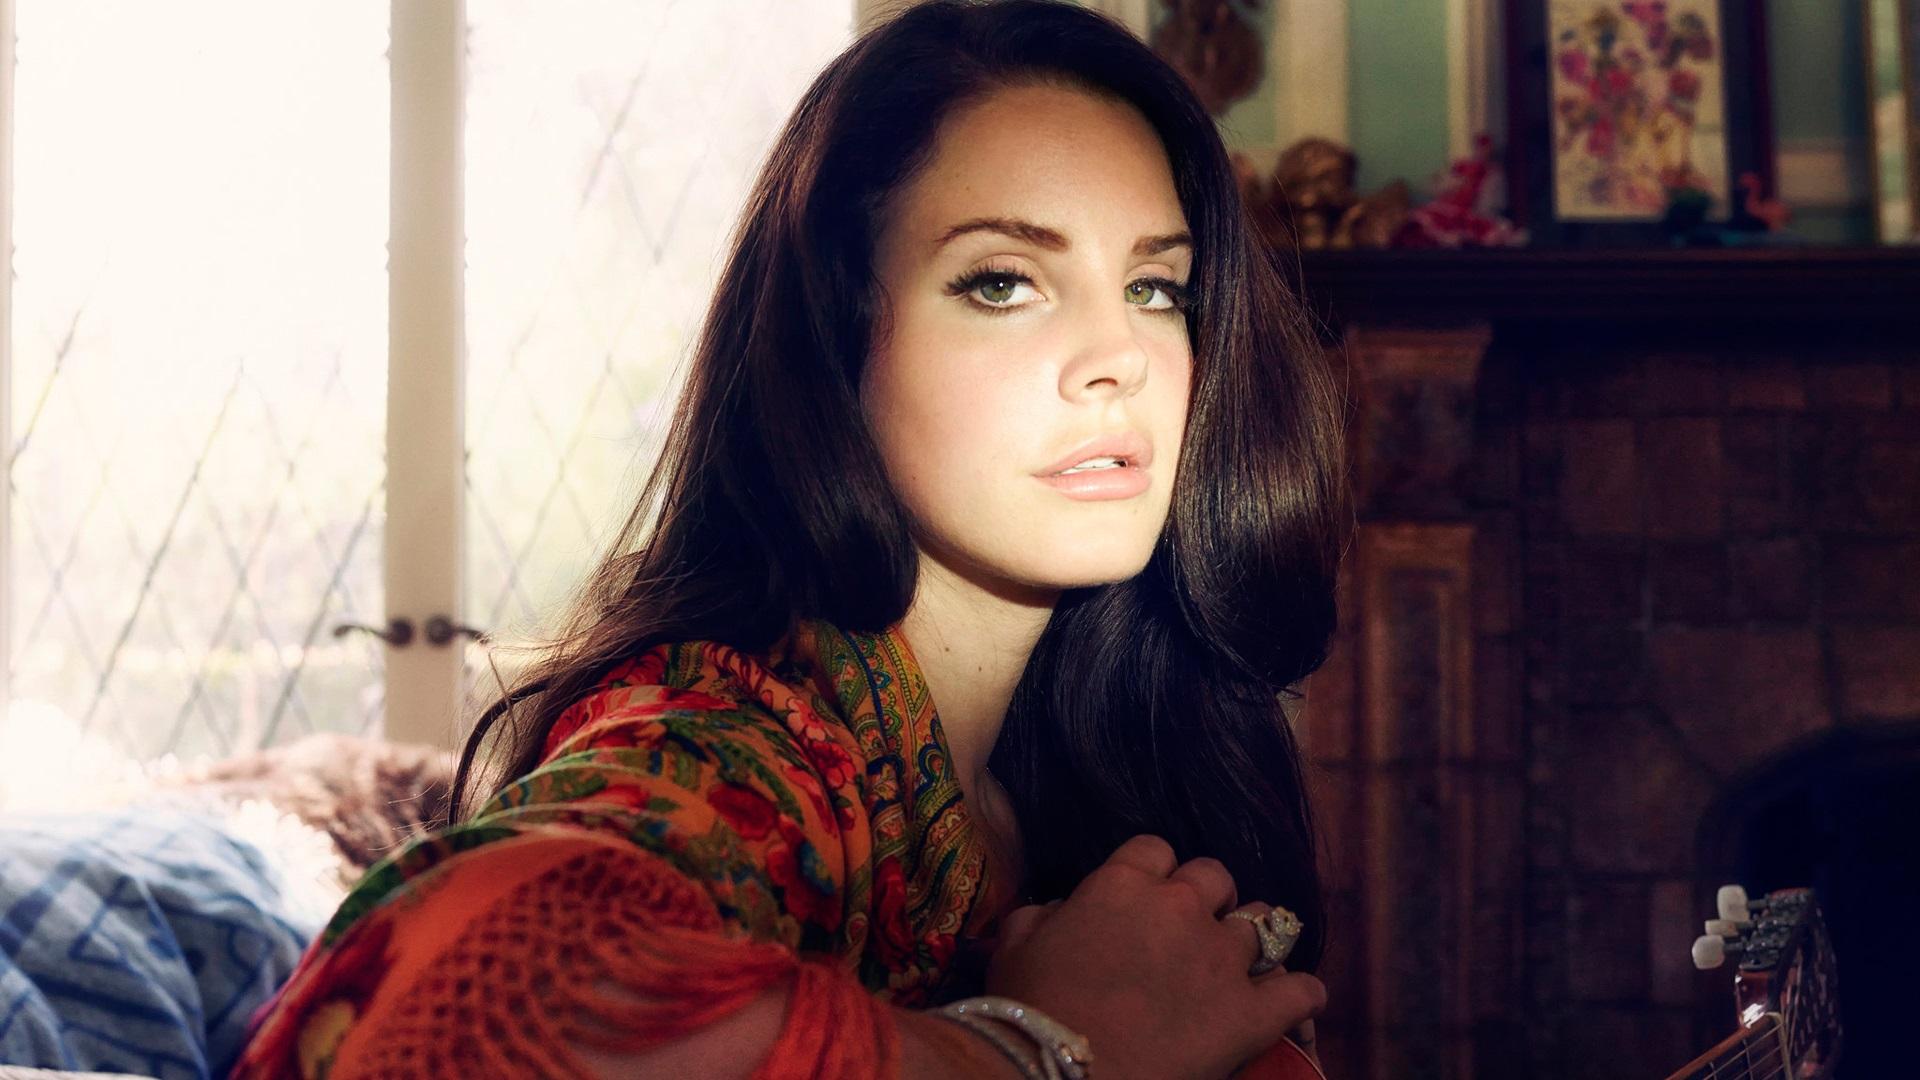 Lana Del Rey 05 640x1136 Iphone 5 5s 5c Se Wallpaper Background